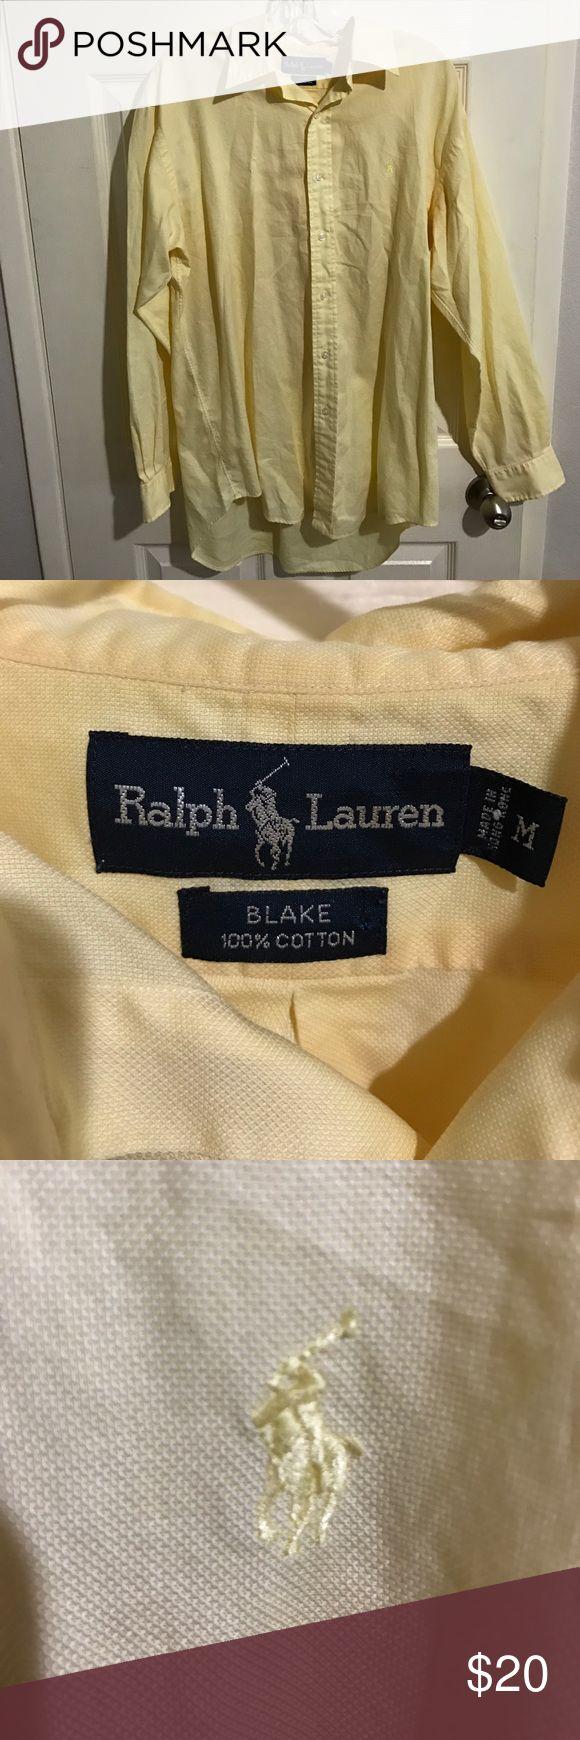 "Ralph Lauren ""Blake"" 100% Cotton Button Down Shirt Ralph Lauren Button Down Shirt ""Blake"" 100% cotton, excellent condition. Very Nice Shirt, great color, logo is same color as shirt. Size M Make an Offer! Ralph Lauren Shirts Casual Button Down Shirts"